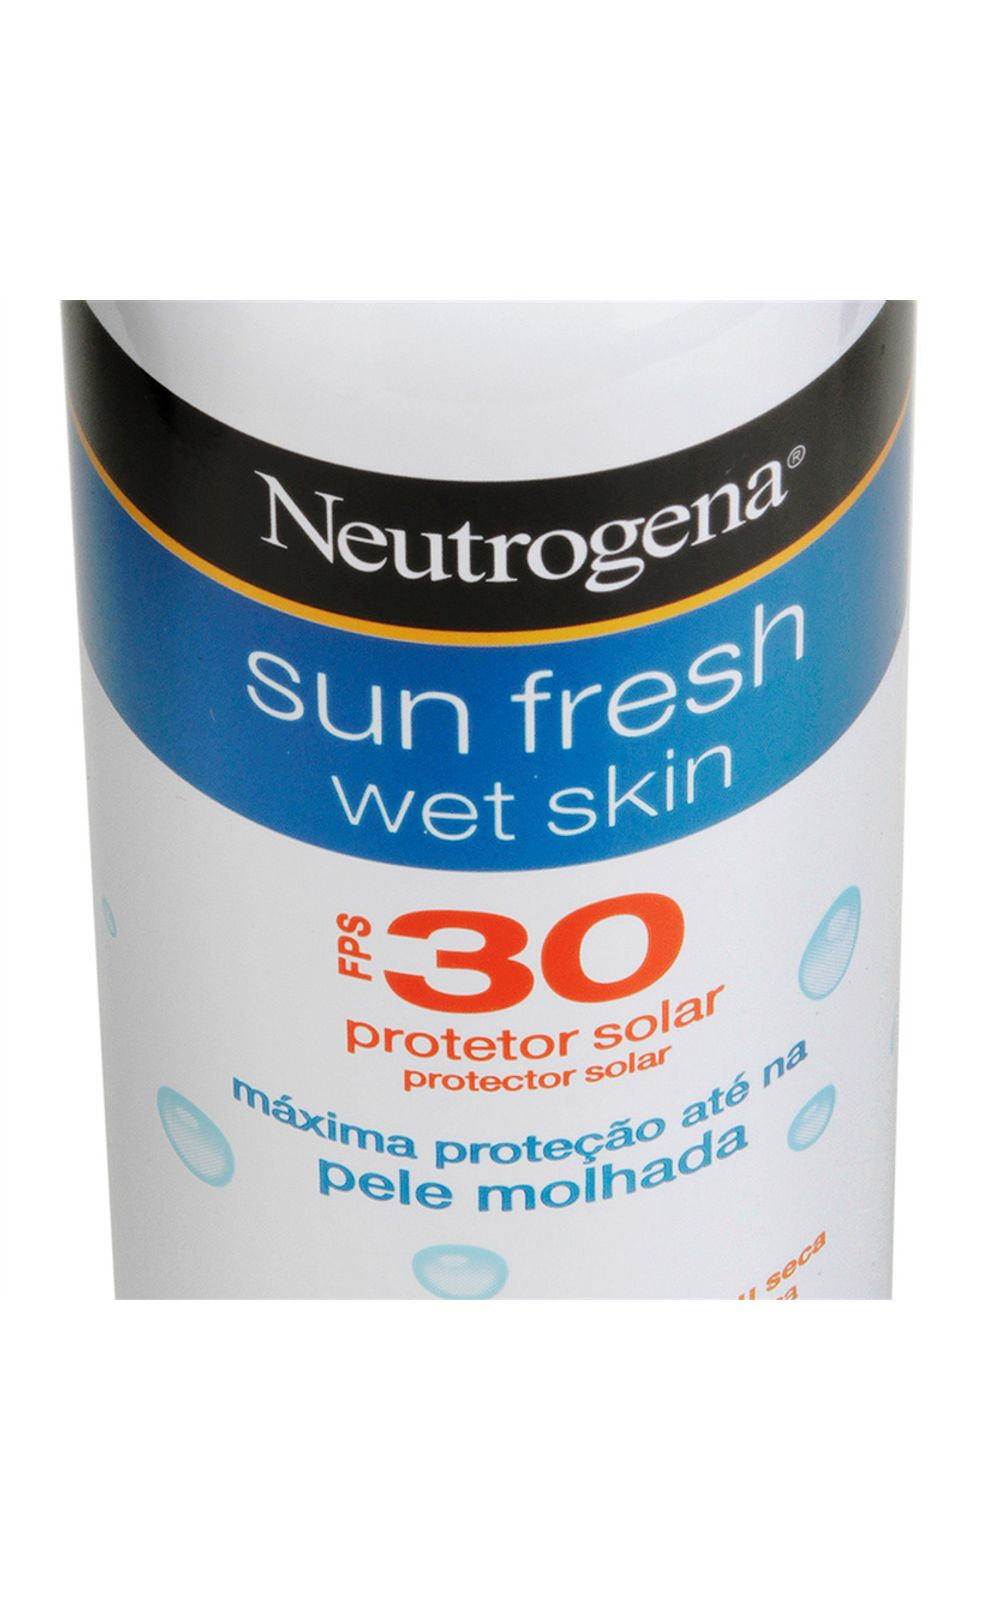 Foto 2 - Protetor Solar Neutrogena Sun Fresh Wet Skin FPS 30 - 180ml